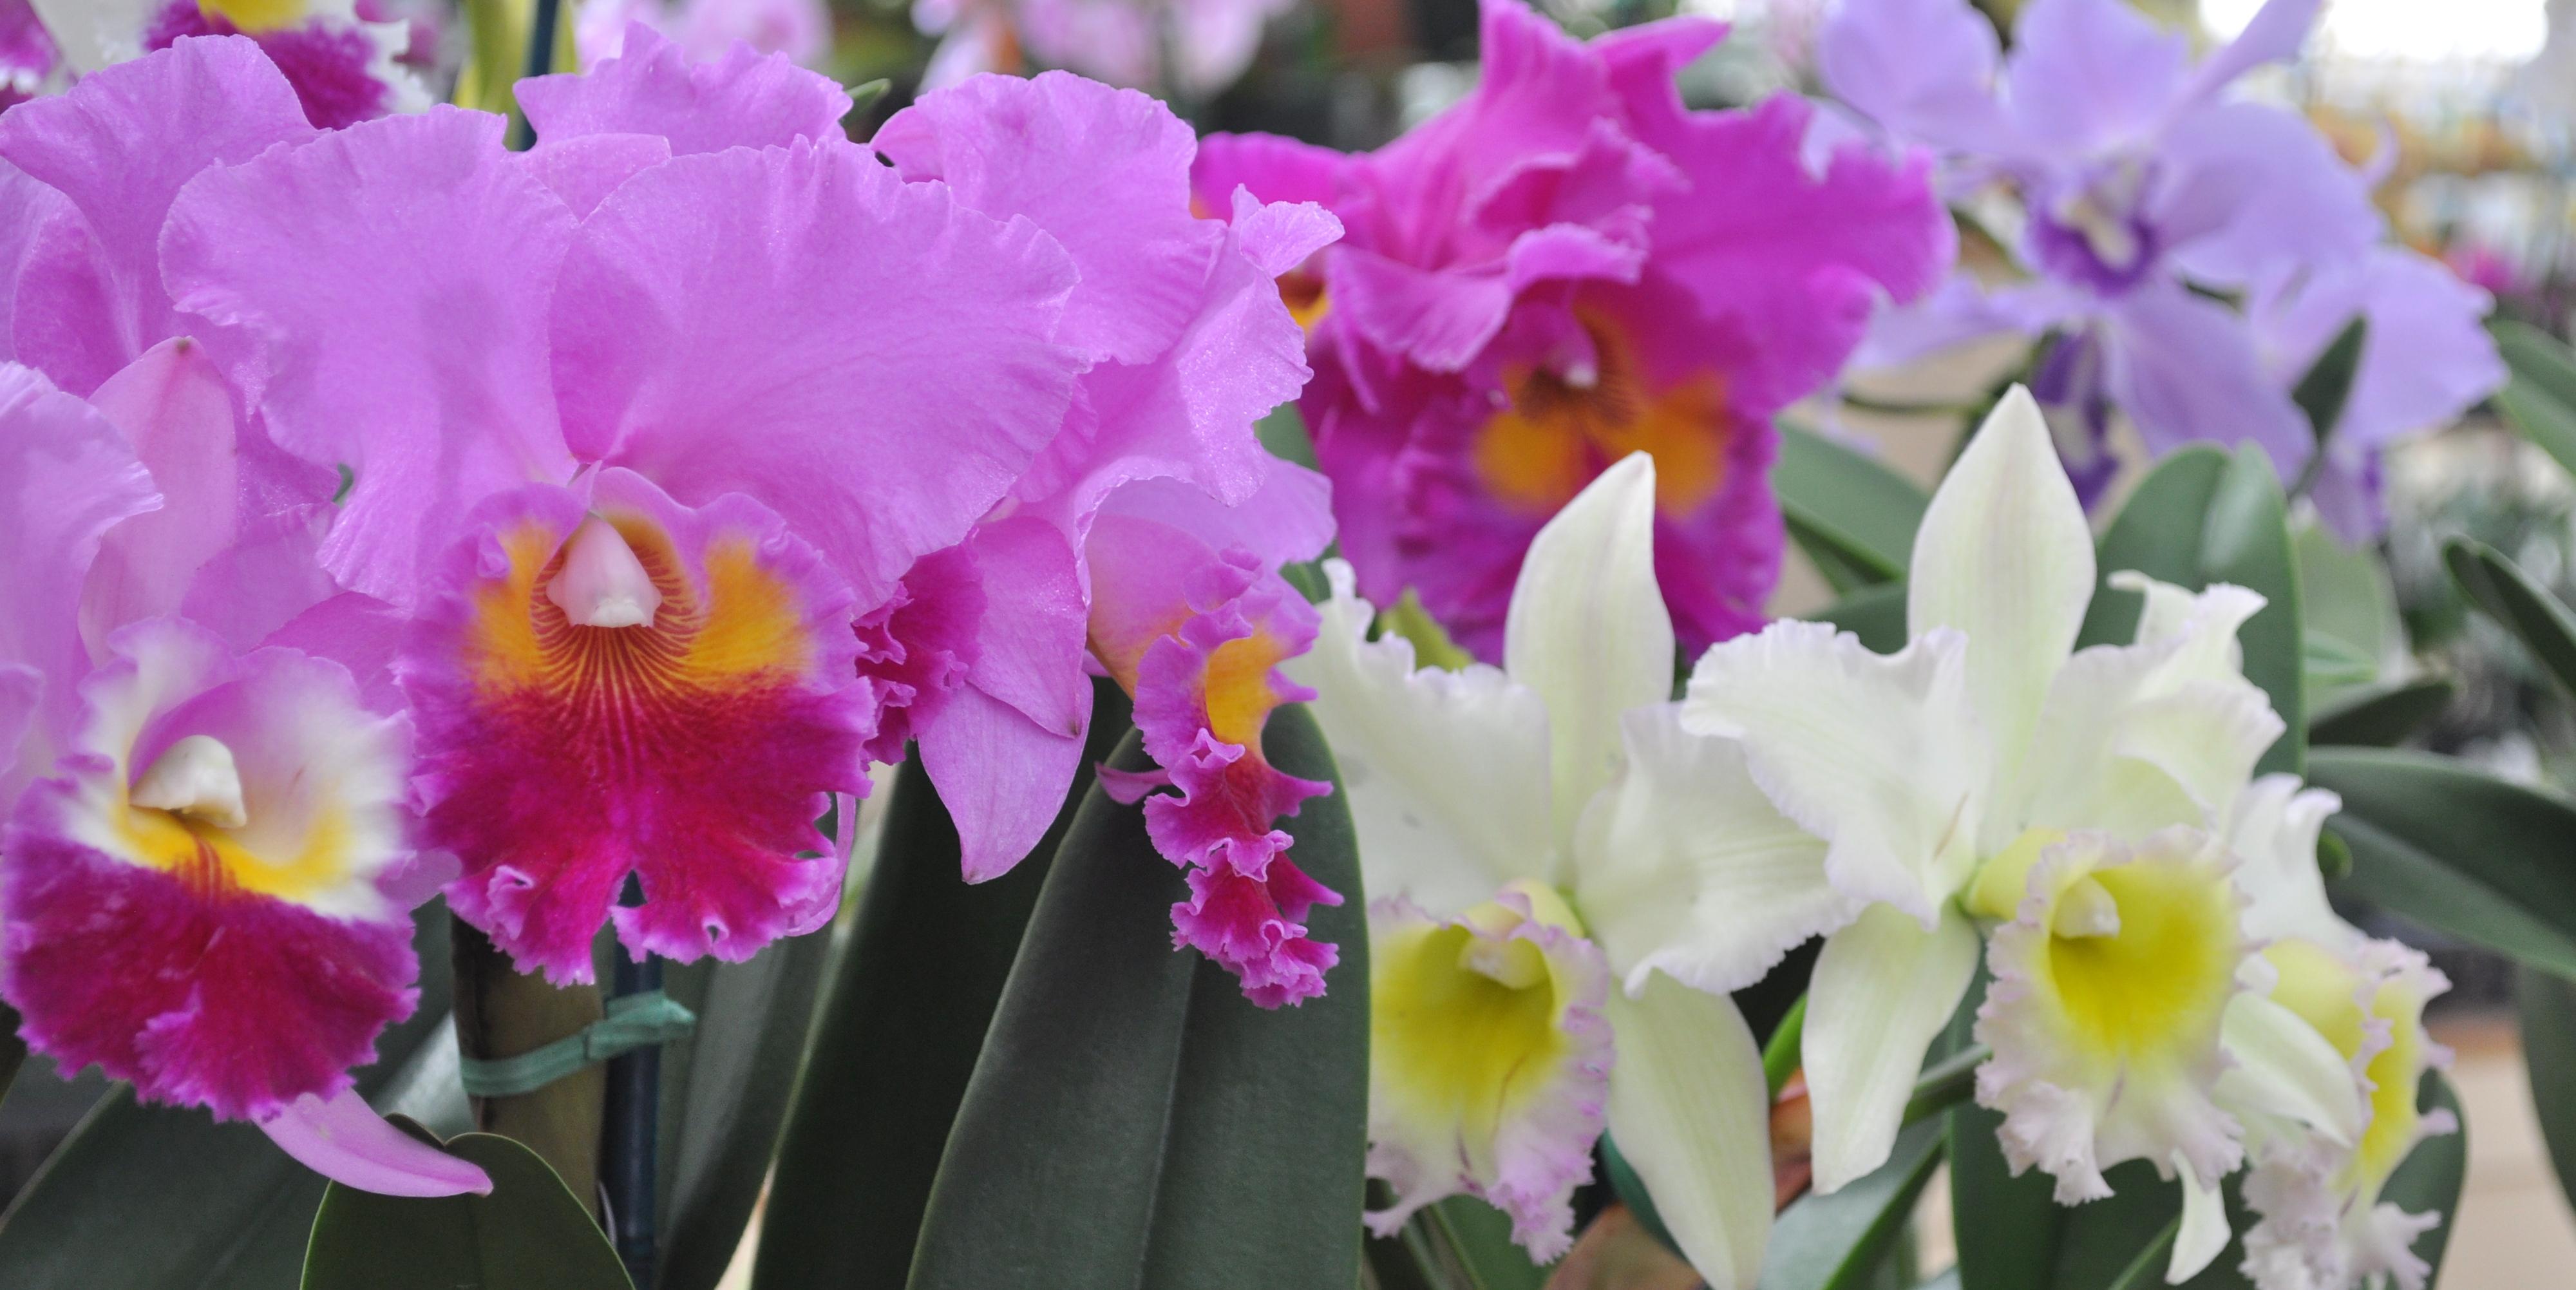 akatsuka orchid gardens, Beautiful flower